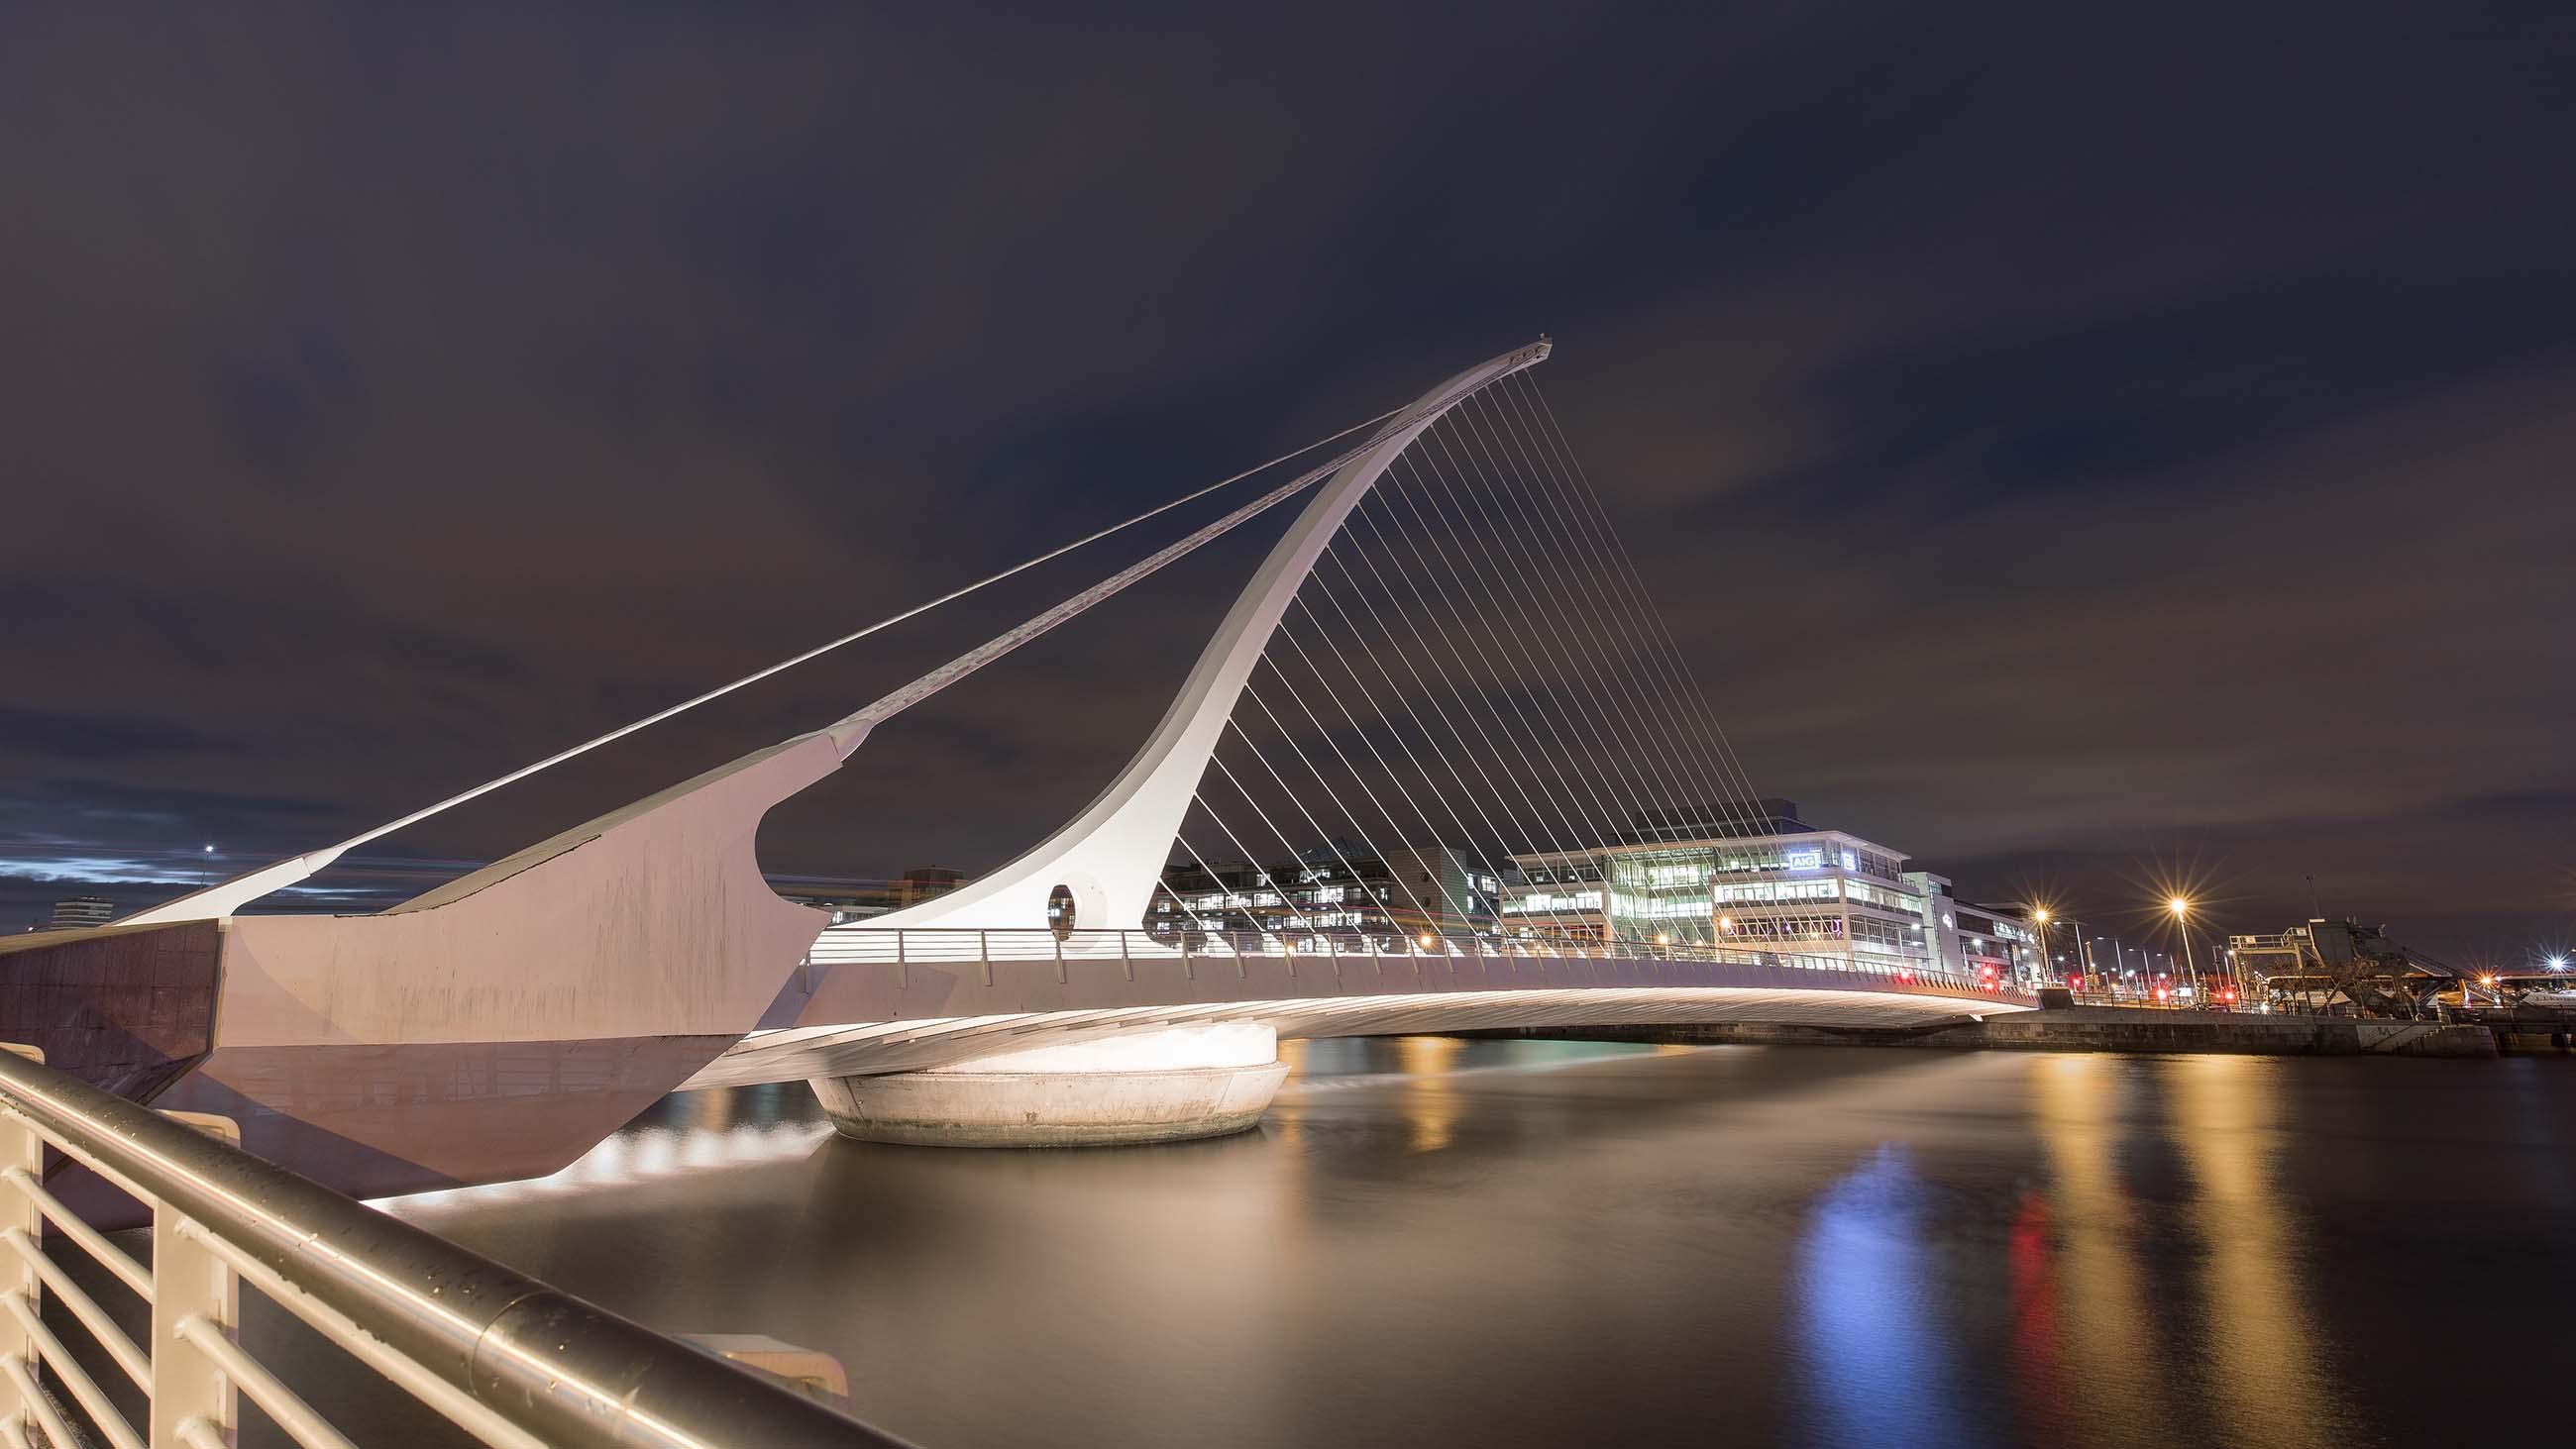 dublin-ireland-europe-bridge-street-famous-place-city-pub-themovinglens-colourfull-travel-photography-destination-life